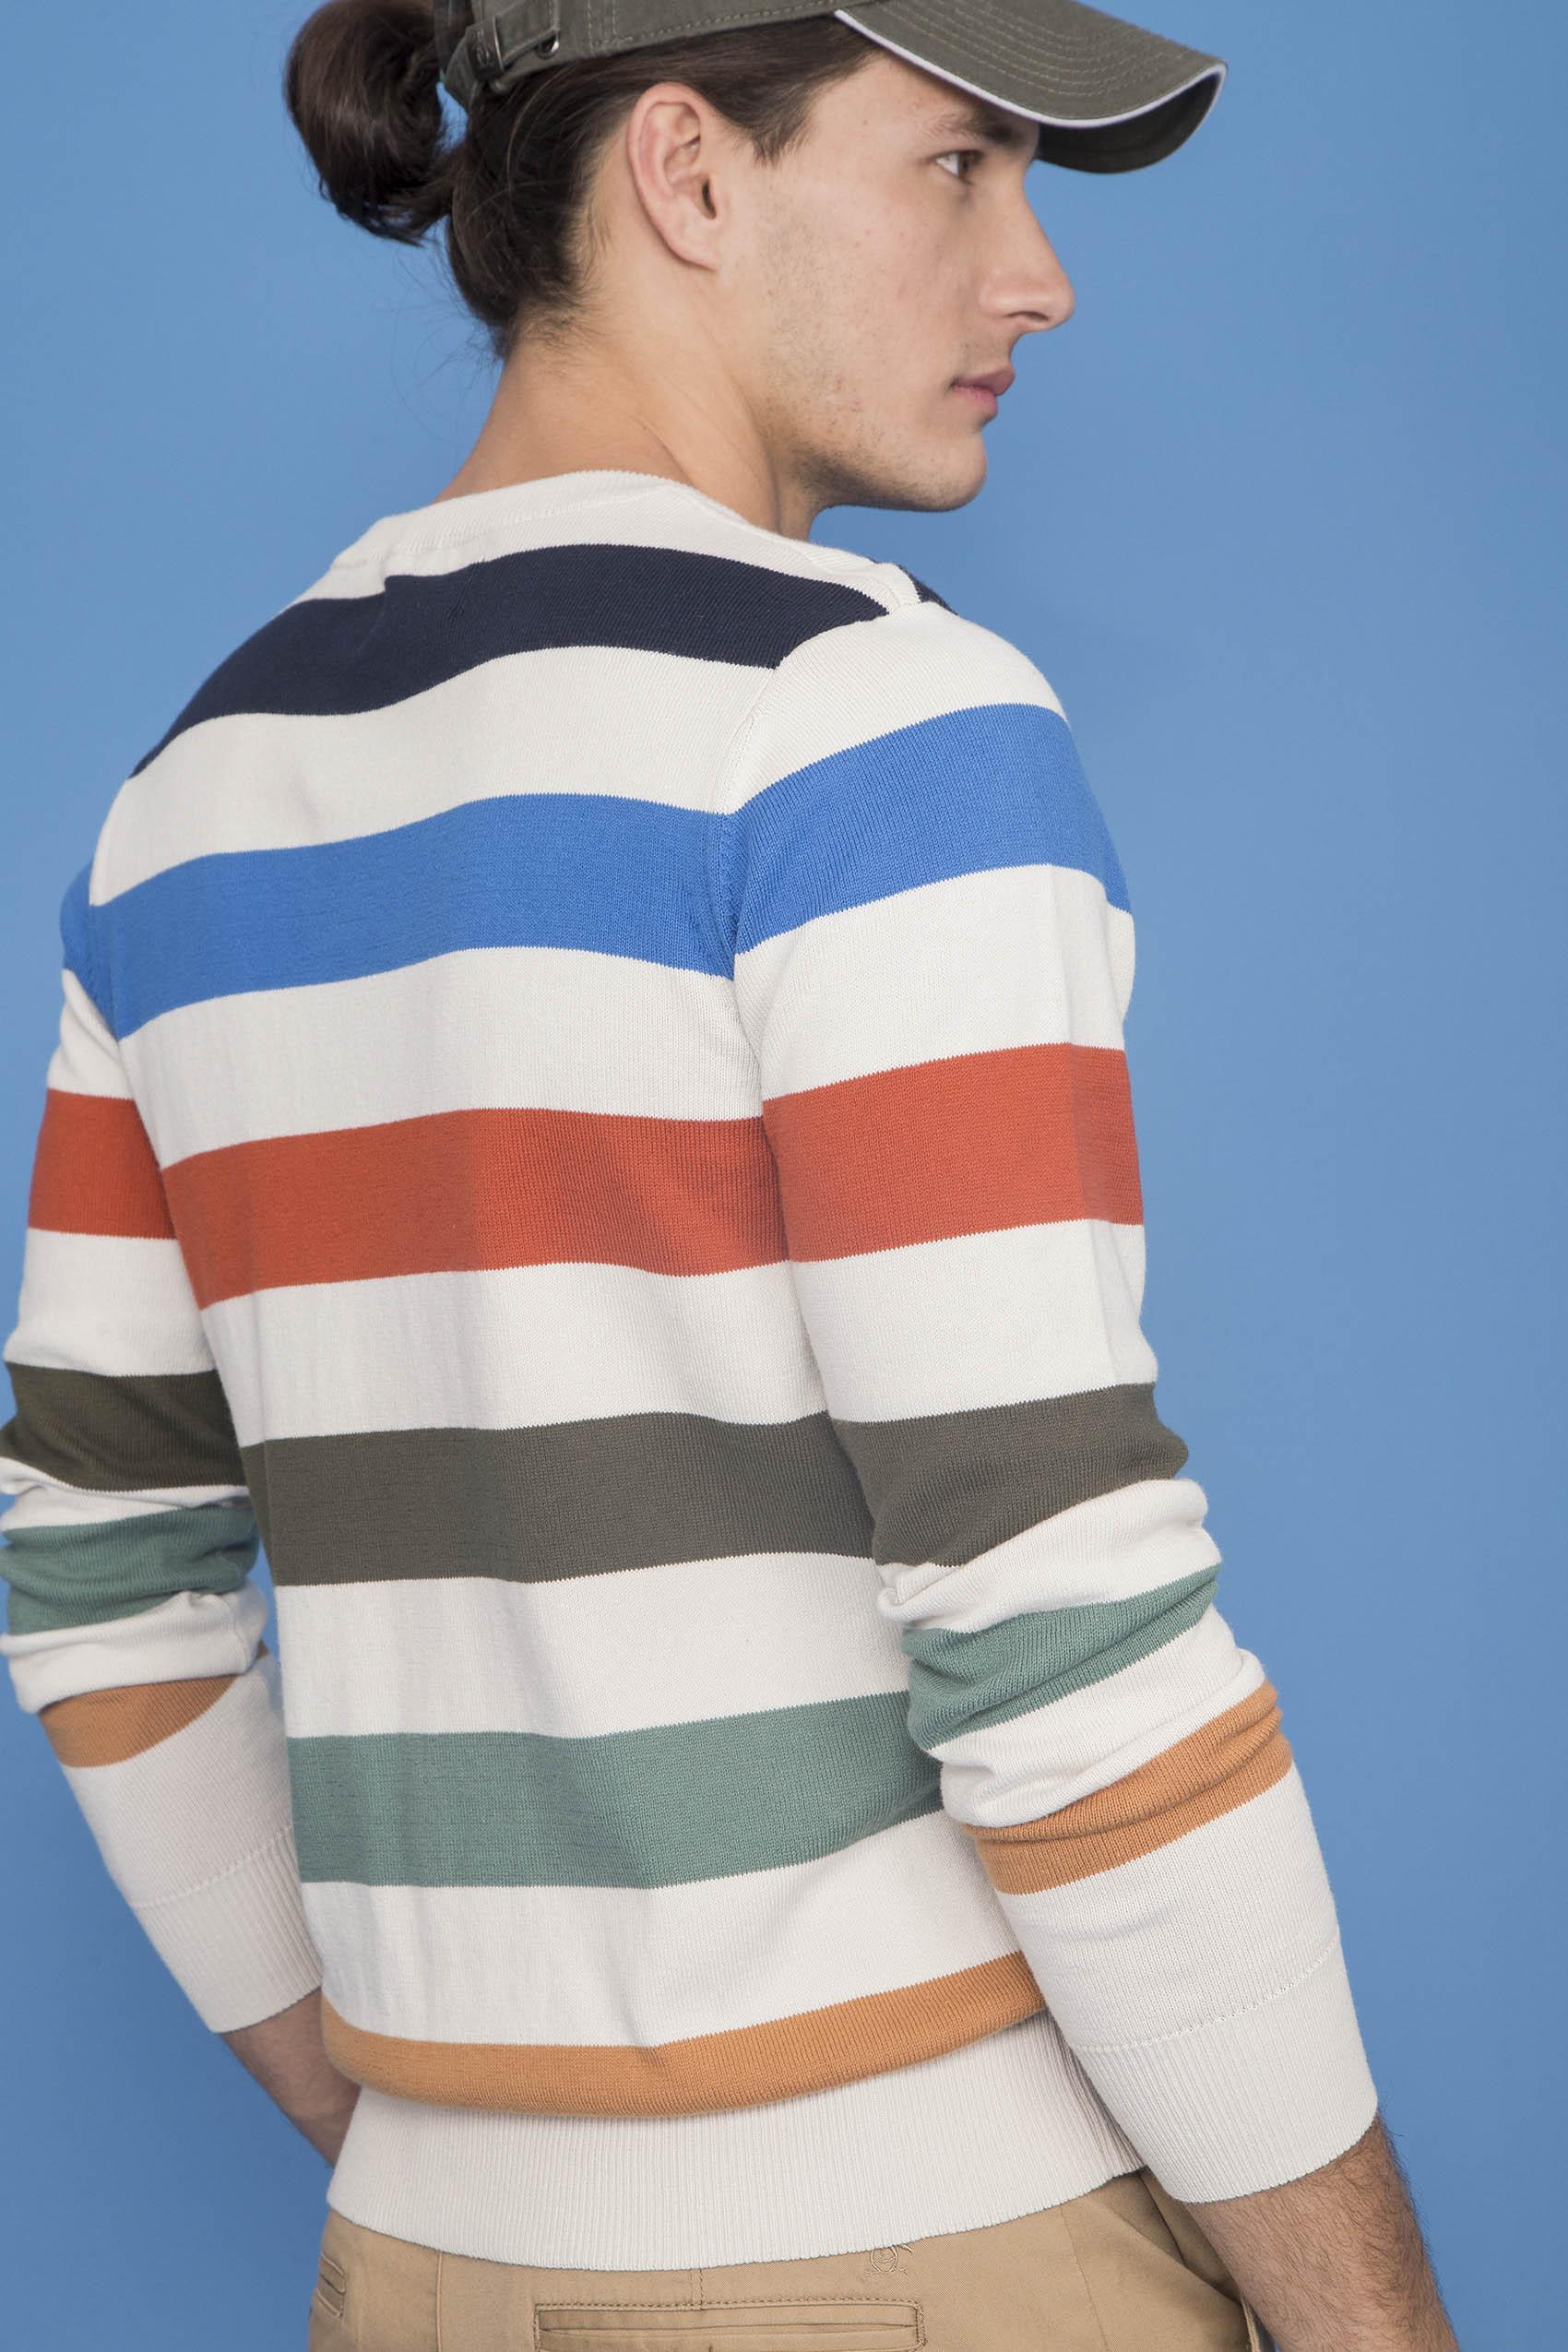 penguin_stripe-cotton-cottonsweater_34-25-2020__picture-17413